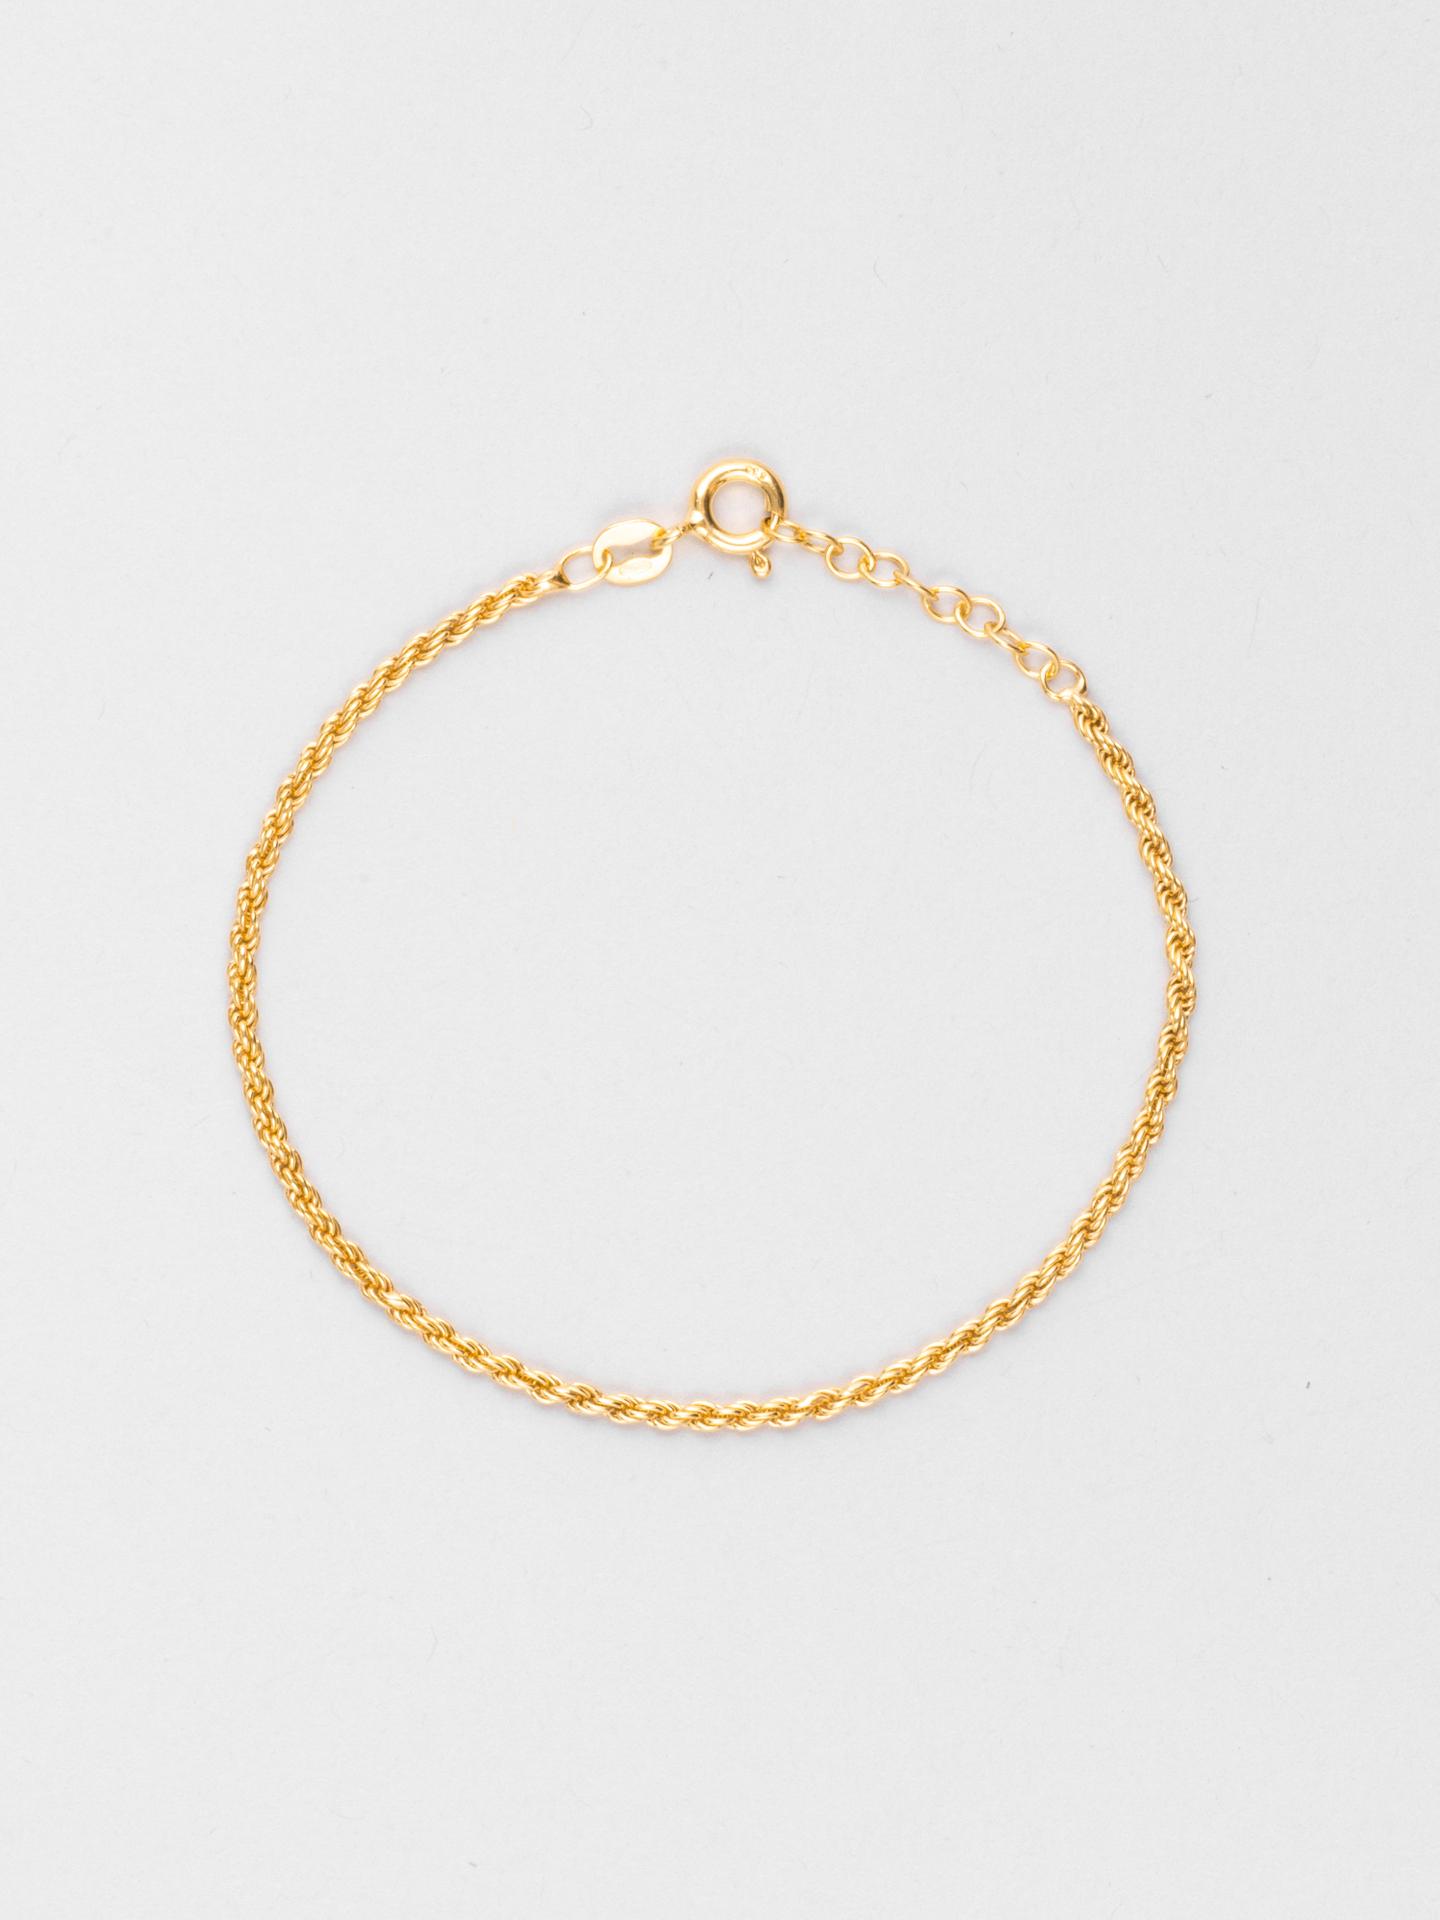 Delicate Rope Bracelet